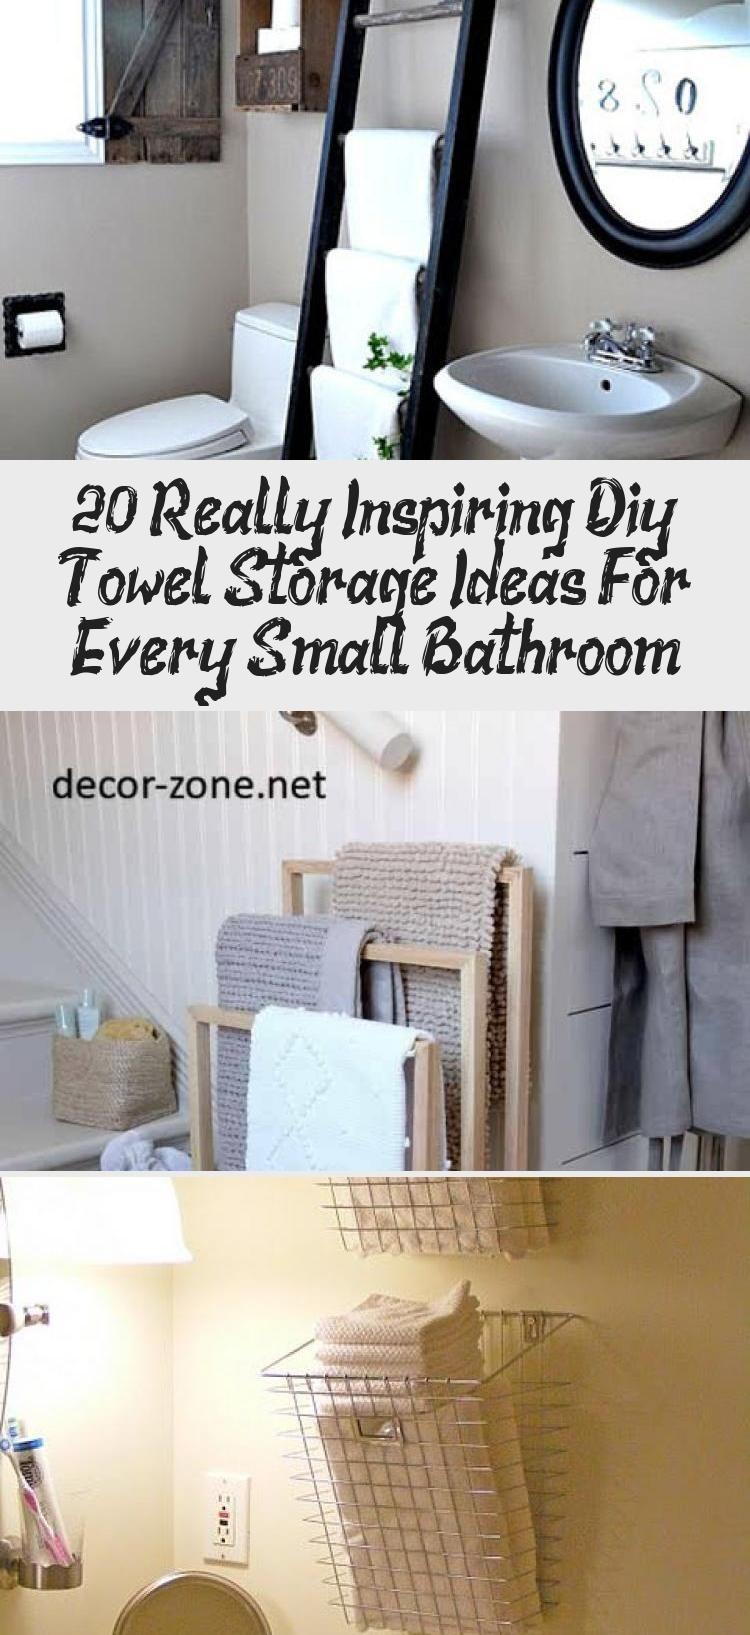 20 Really Inspiring Diy Towel Storage Ideas For Every Small Bathroom Diy Towels Towel Storage Small Bathroom Decor